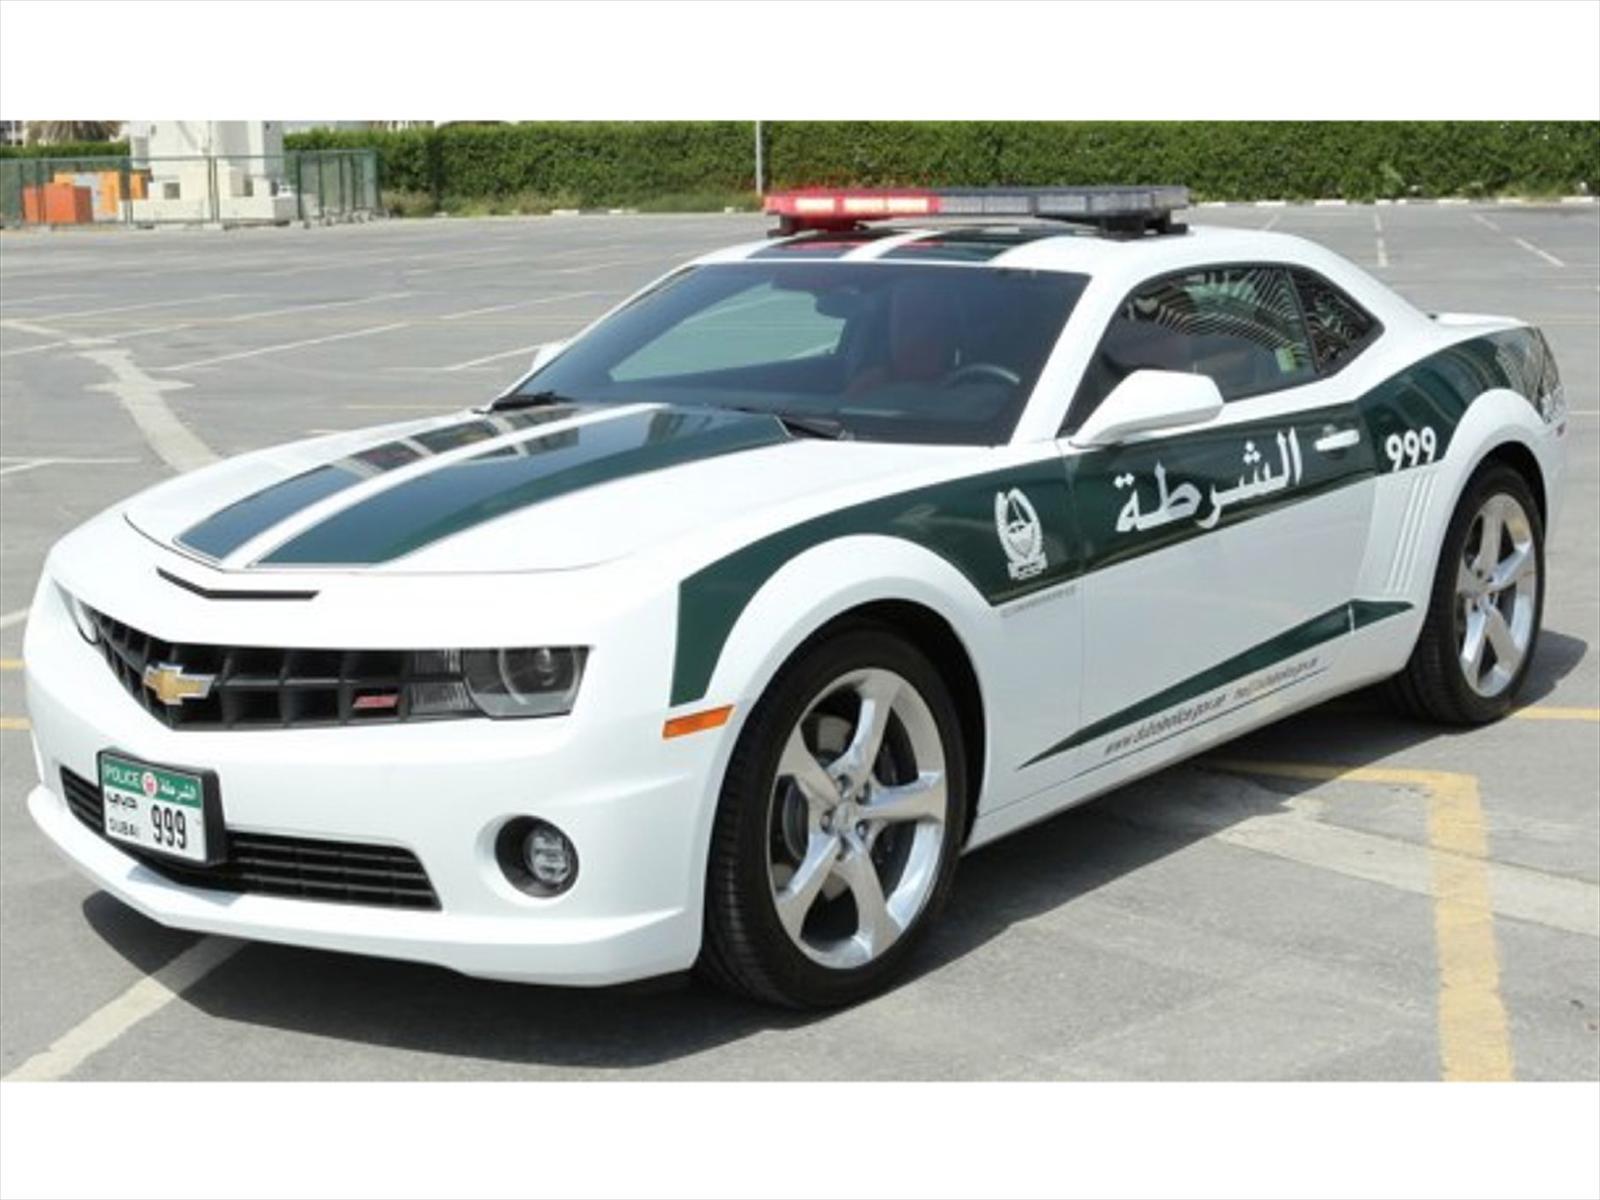 Dodge Charger Car Wallpapers Polic 237 A De Dubai Usa Ferrari Ff Y Lamborghini Aventador